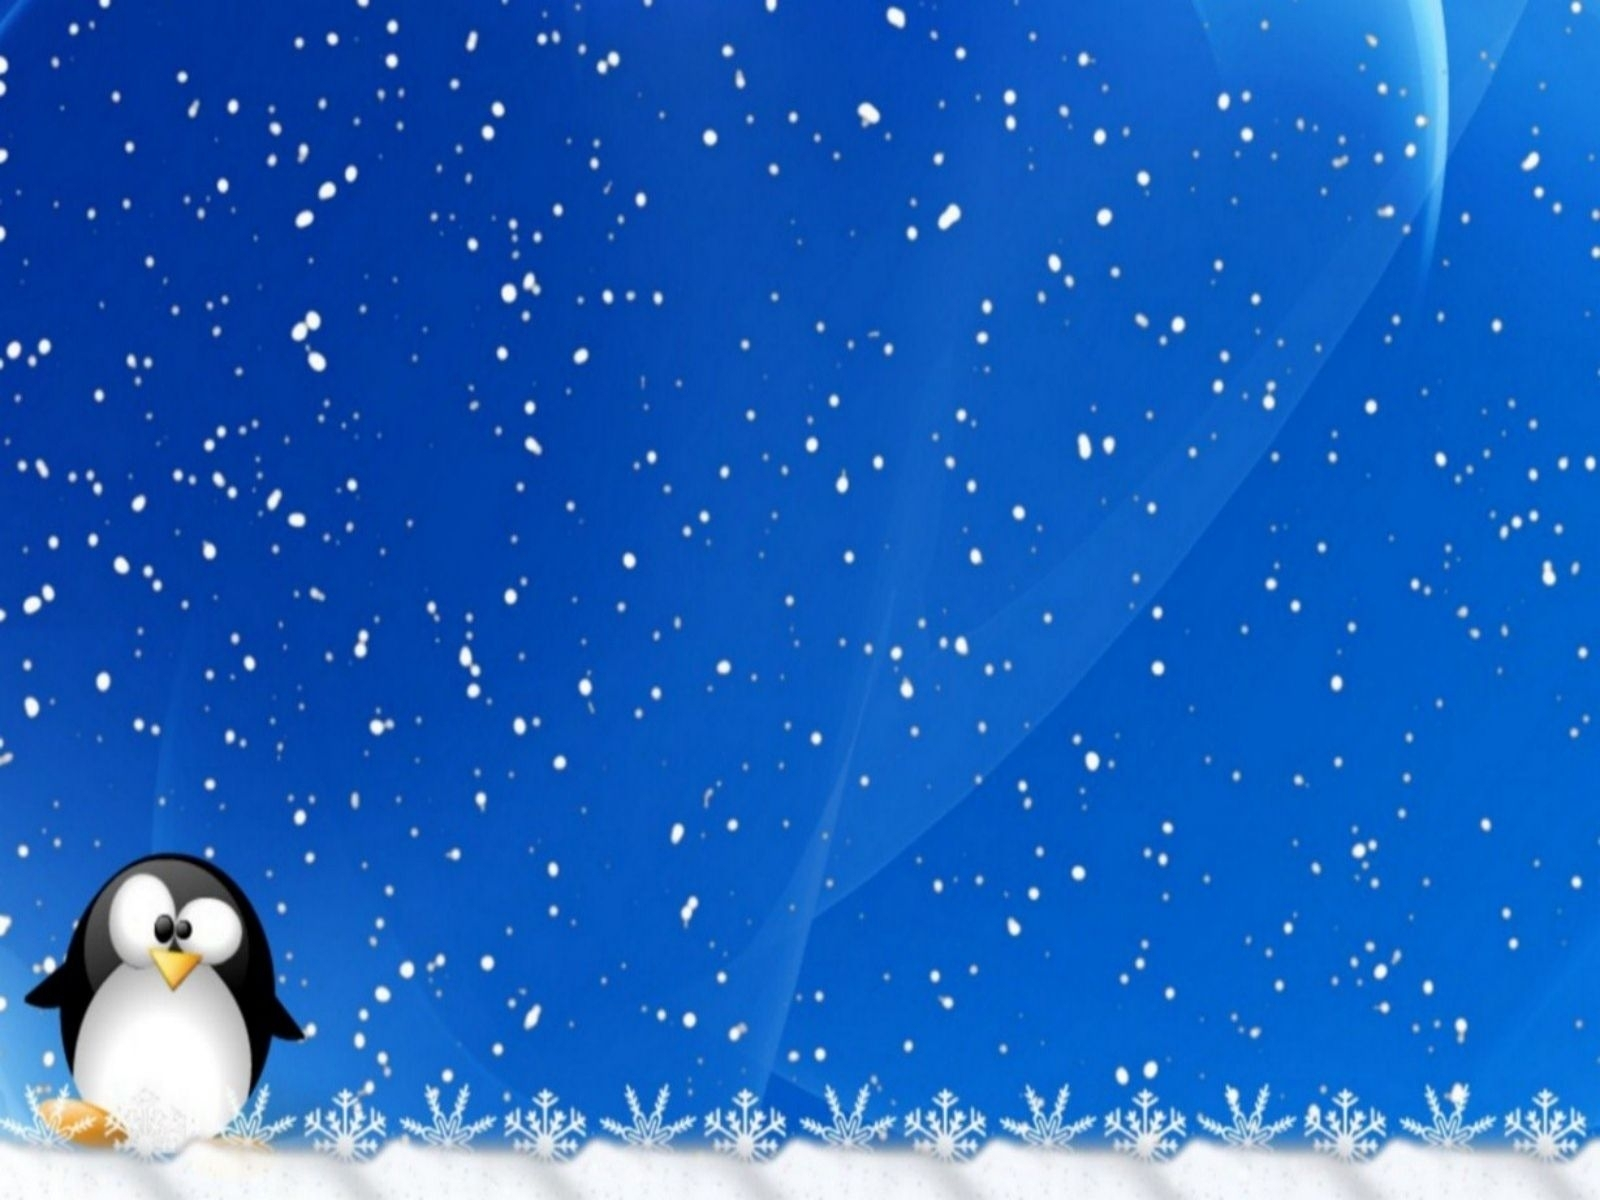 free winter wallpaper backgrounds | wallpapers | pinterest | winter